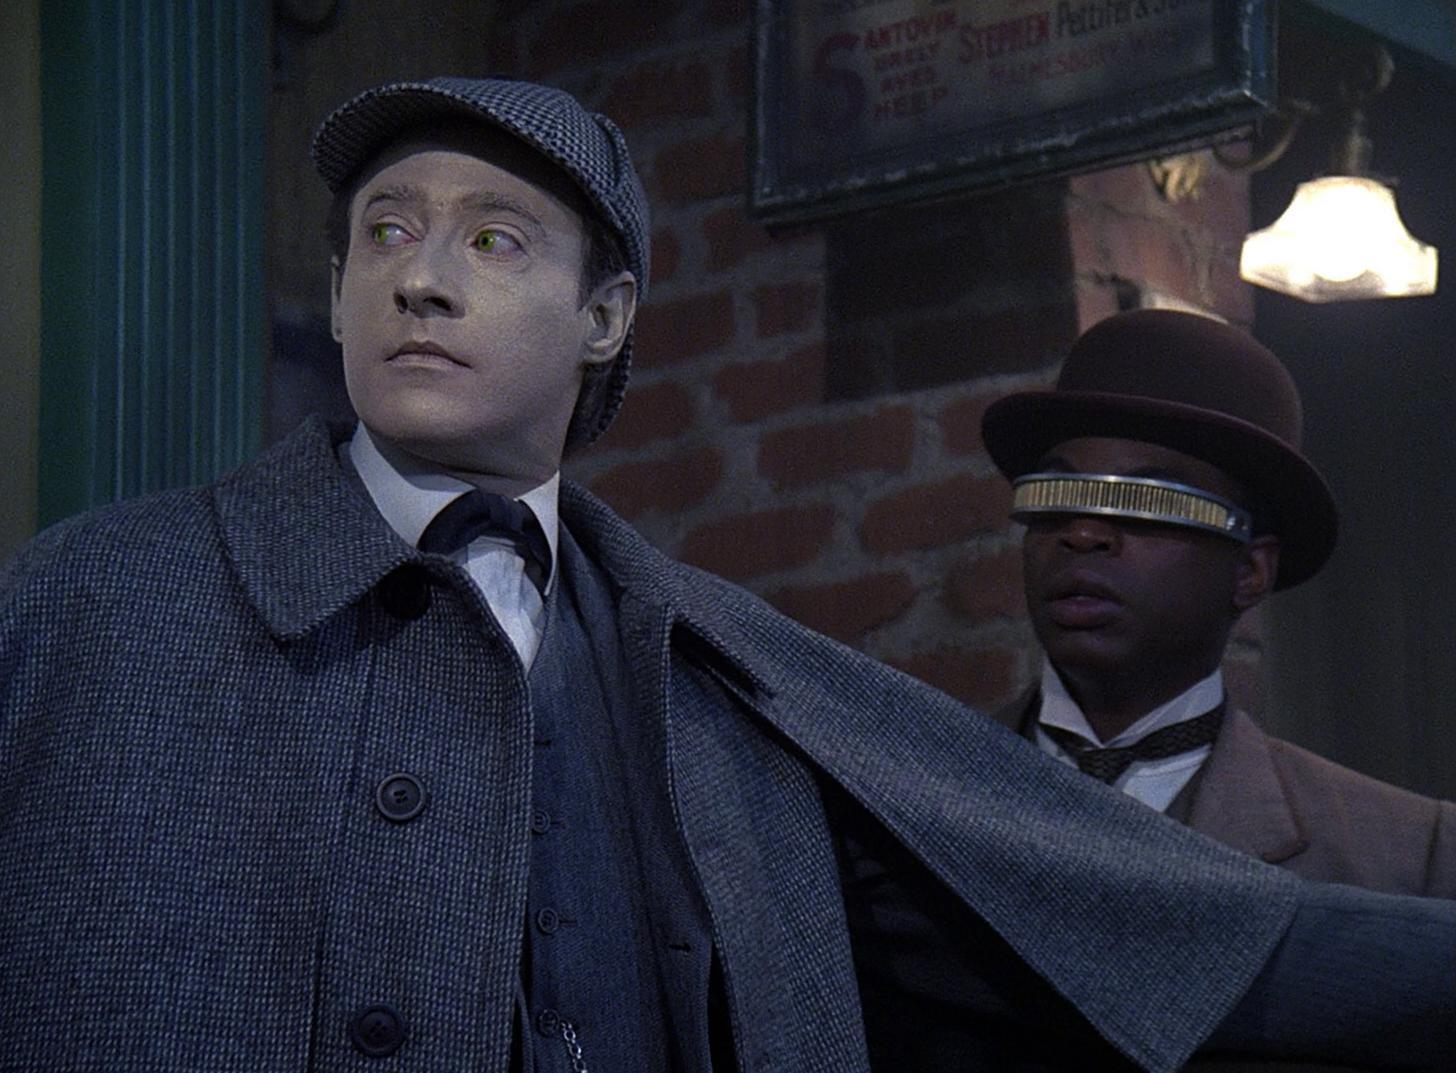 Sherlock Data Holmes